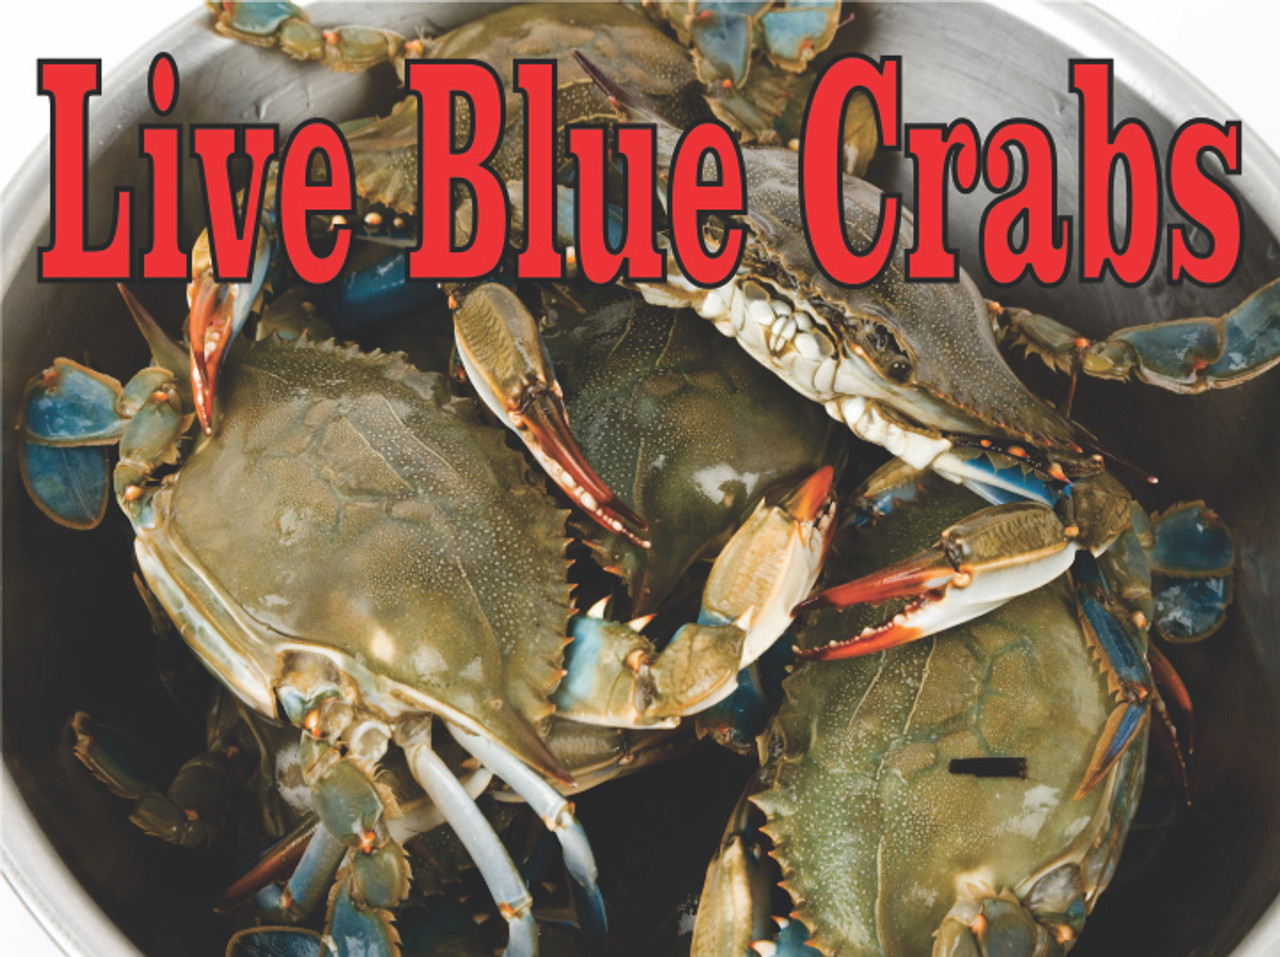 Live Blue Crabs Banner always get noticed.